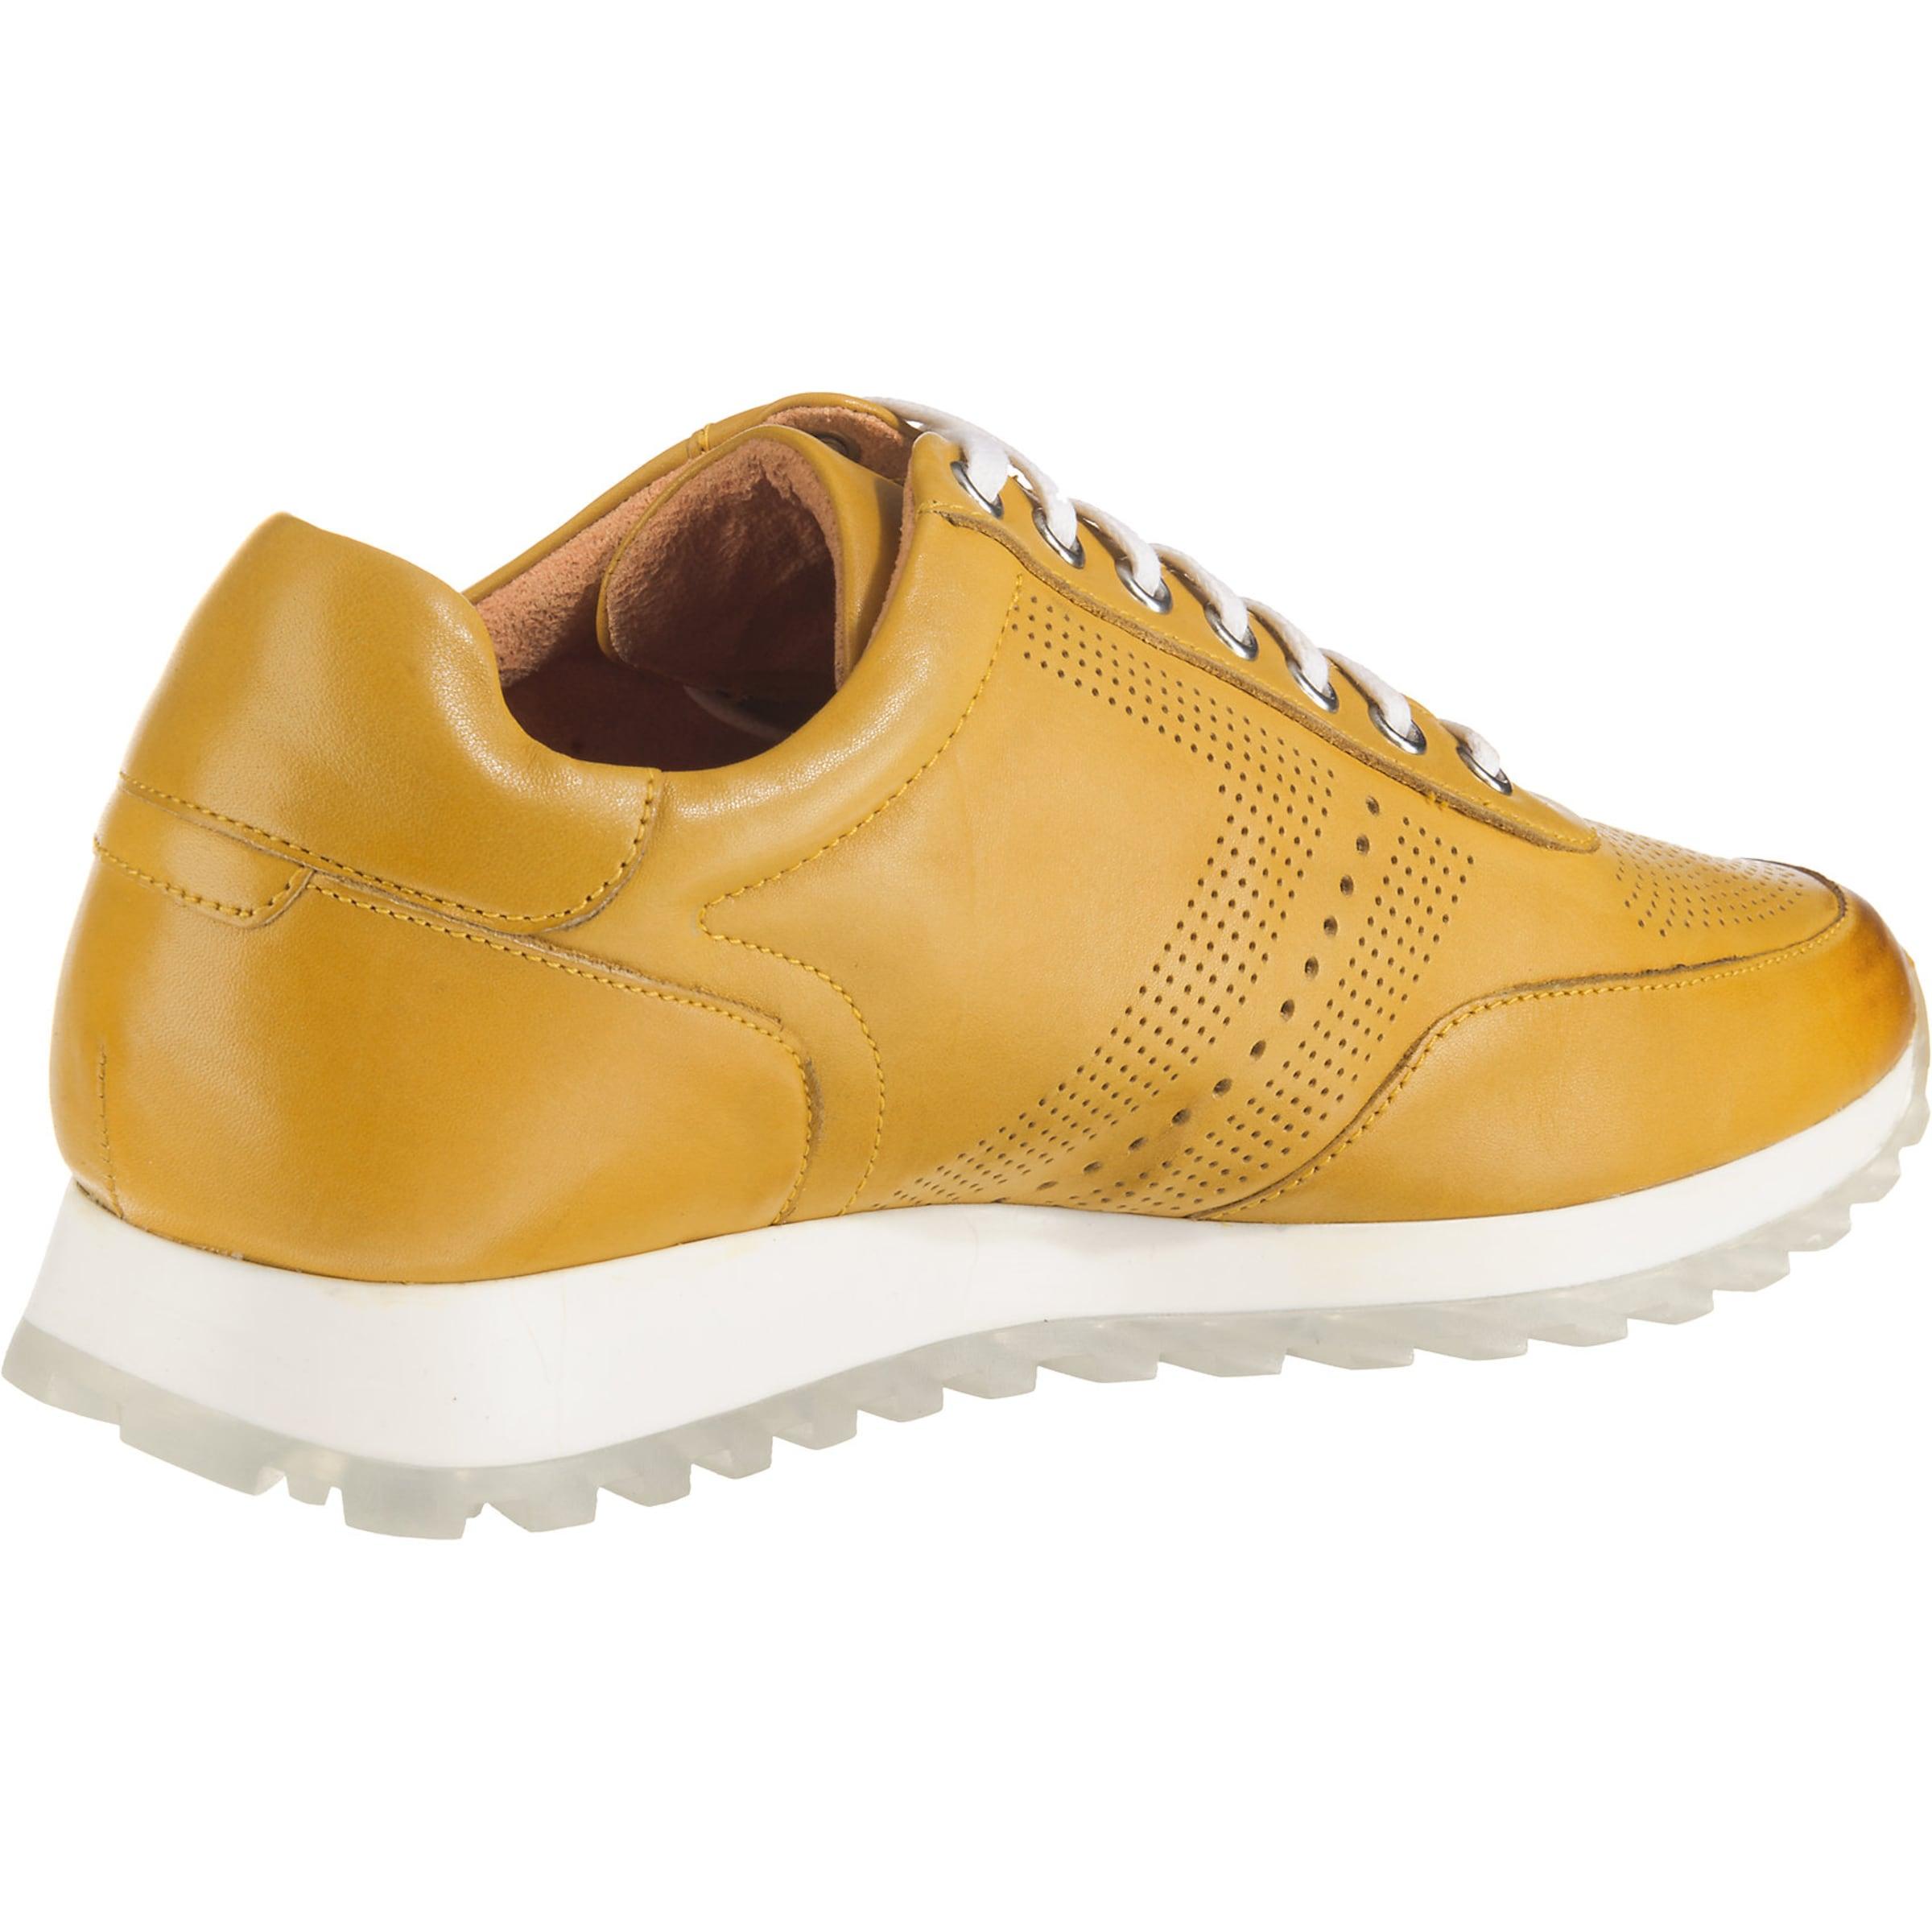 'conte' In Gelb Bros Gordonamp; Sneakers 08nPOkw